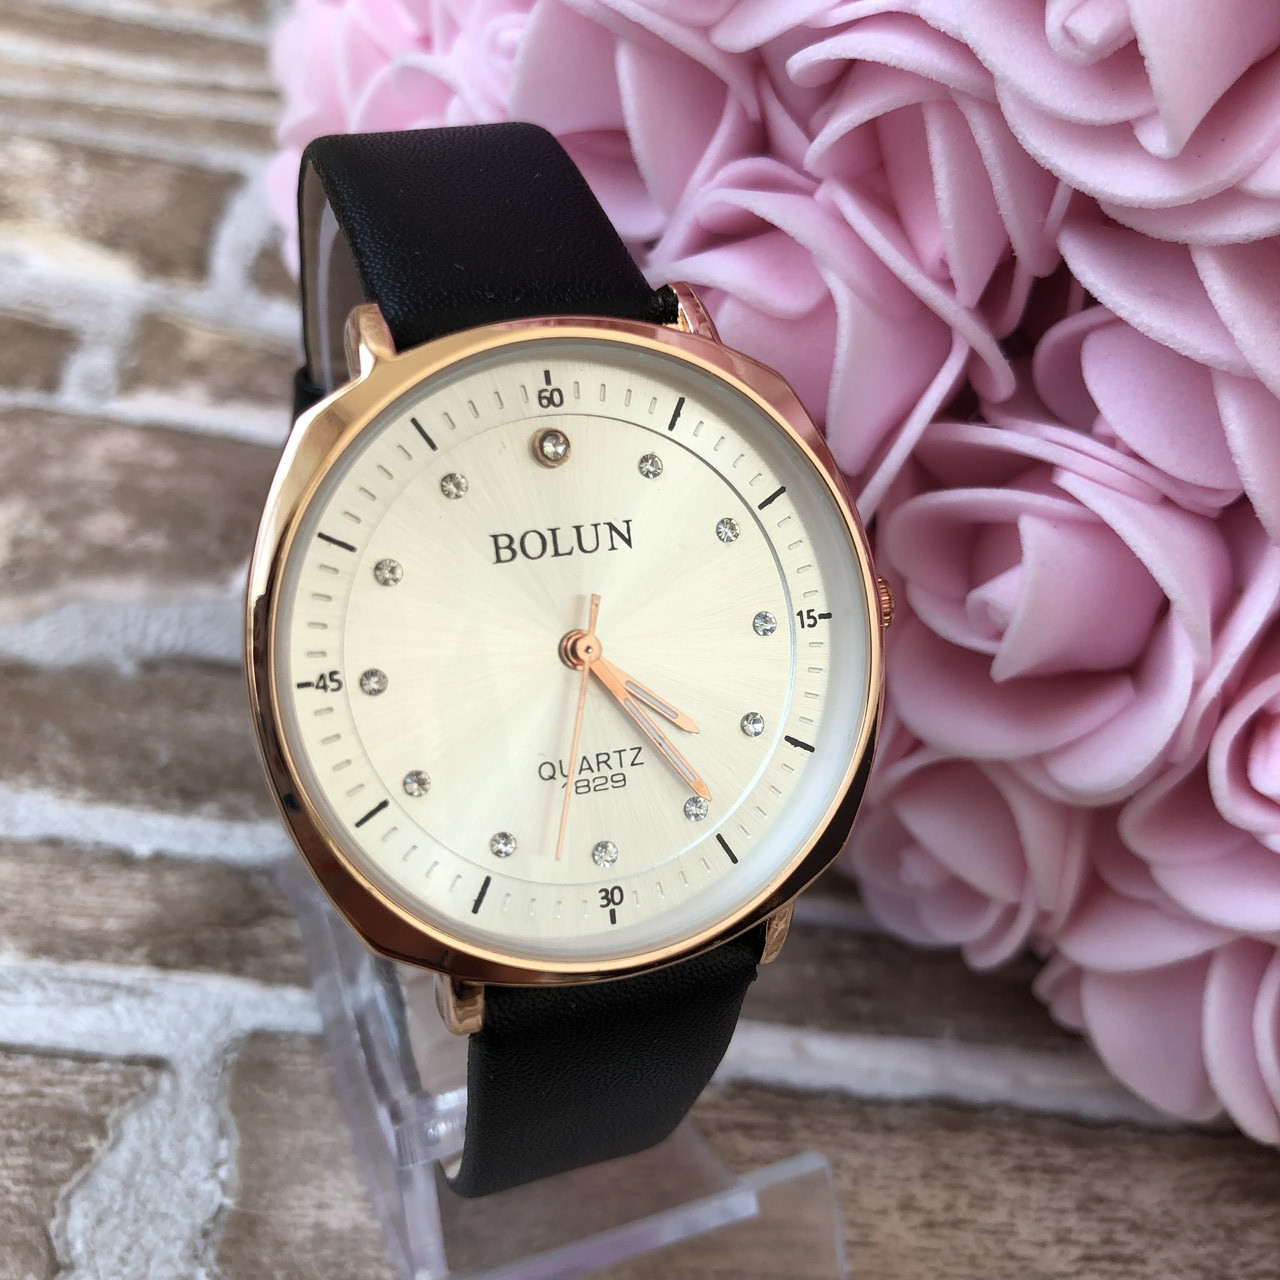 Женские наручные часы Bolun